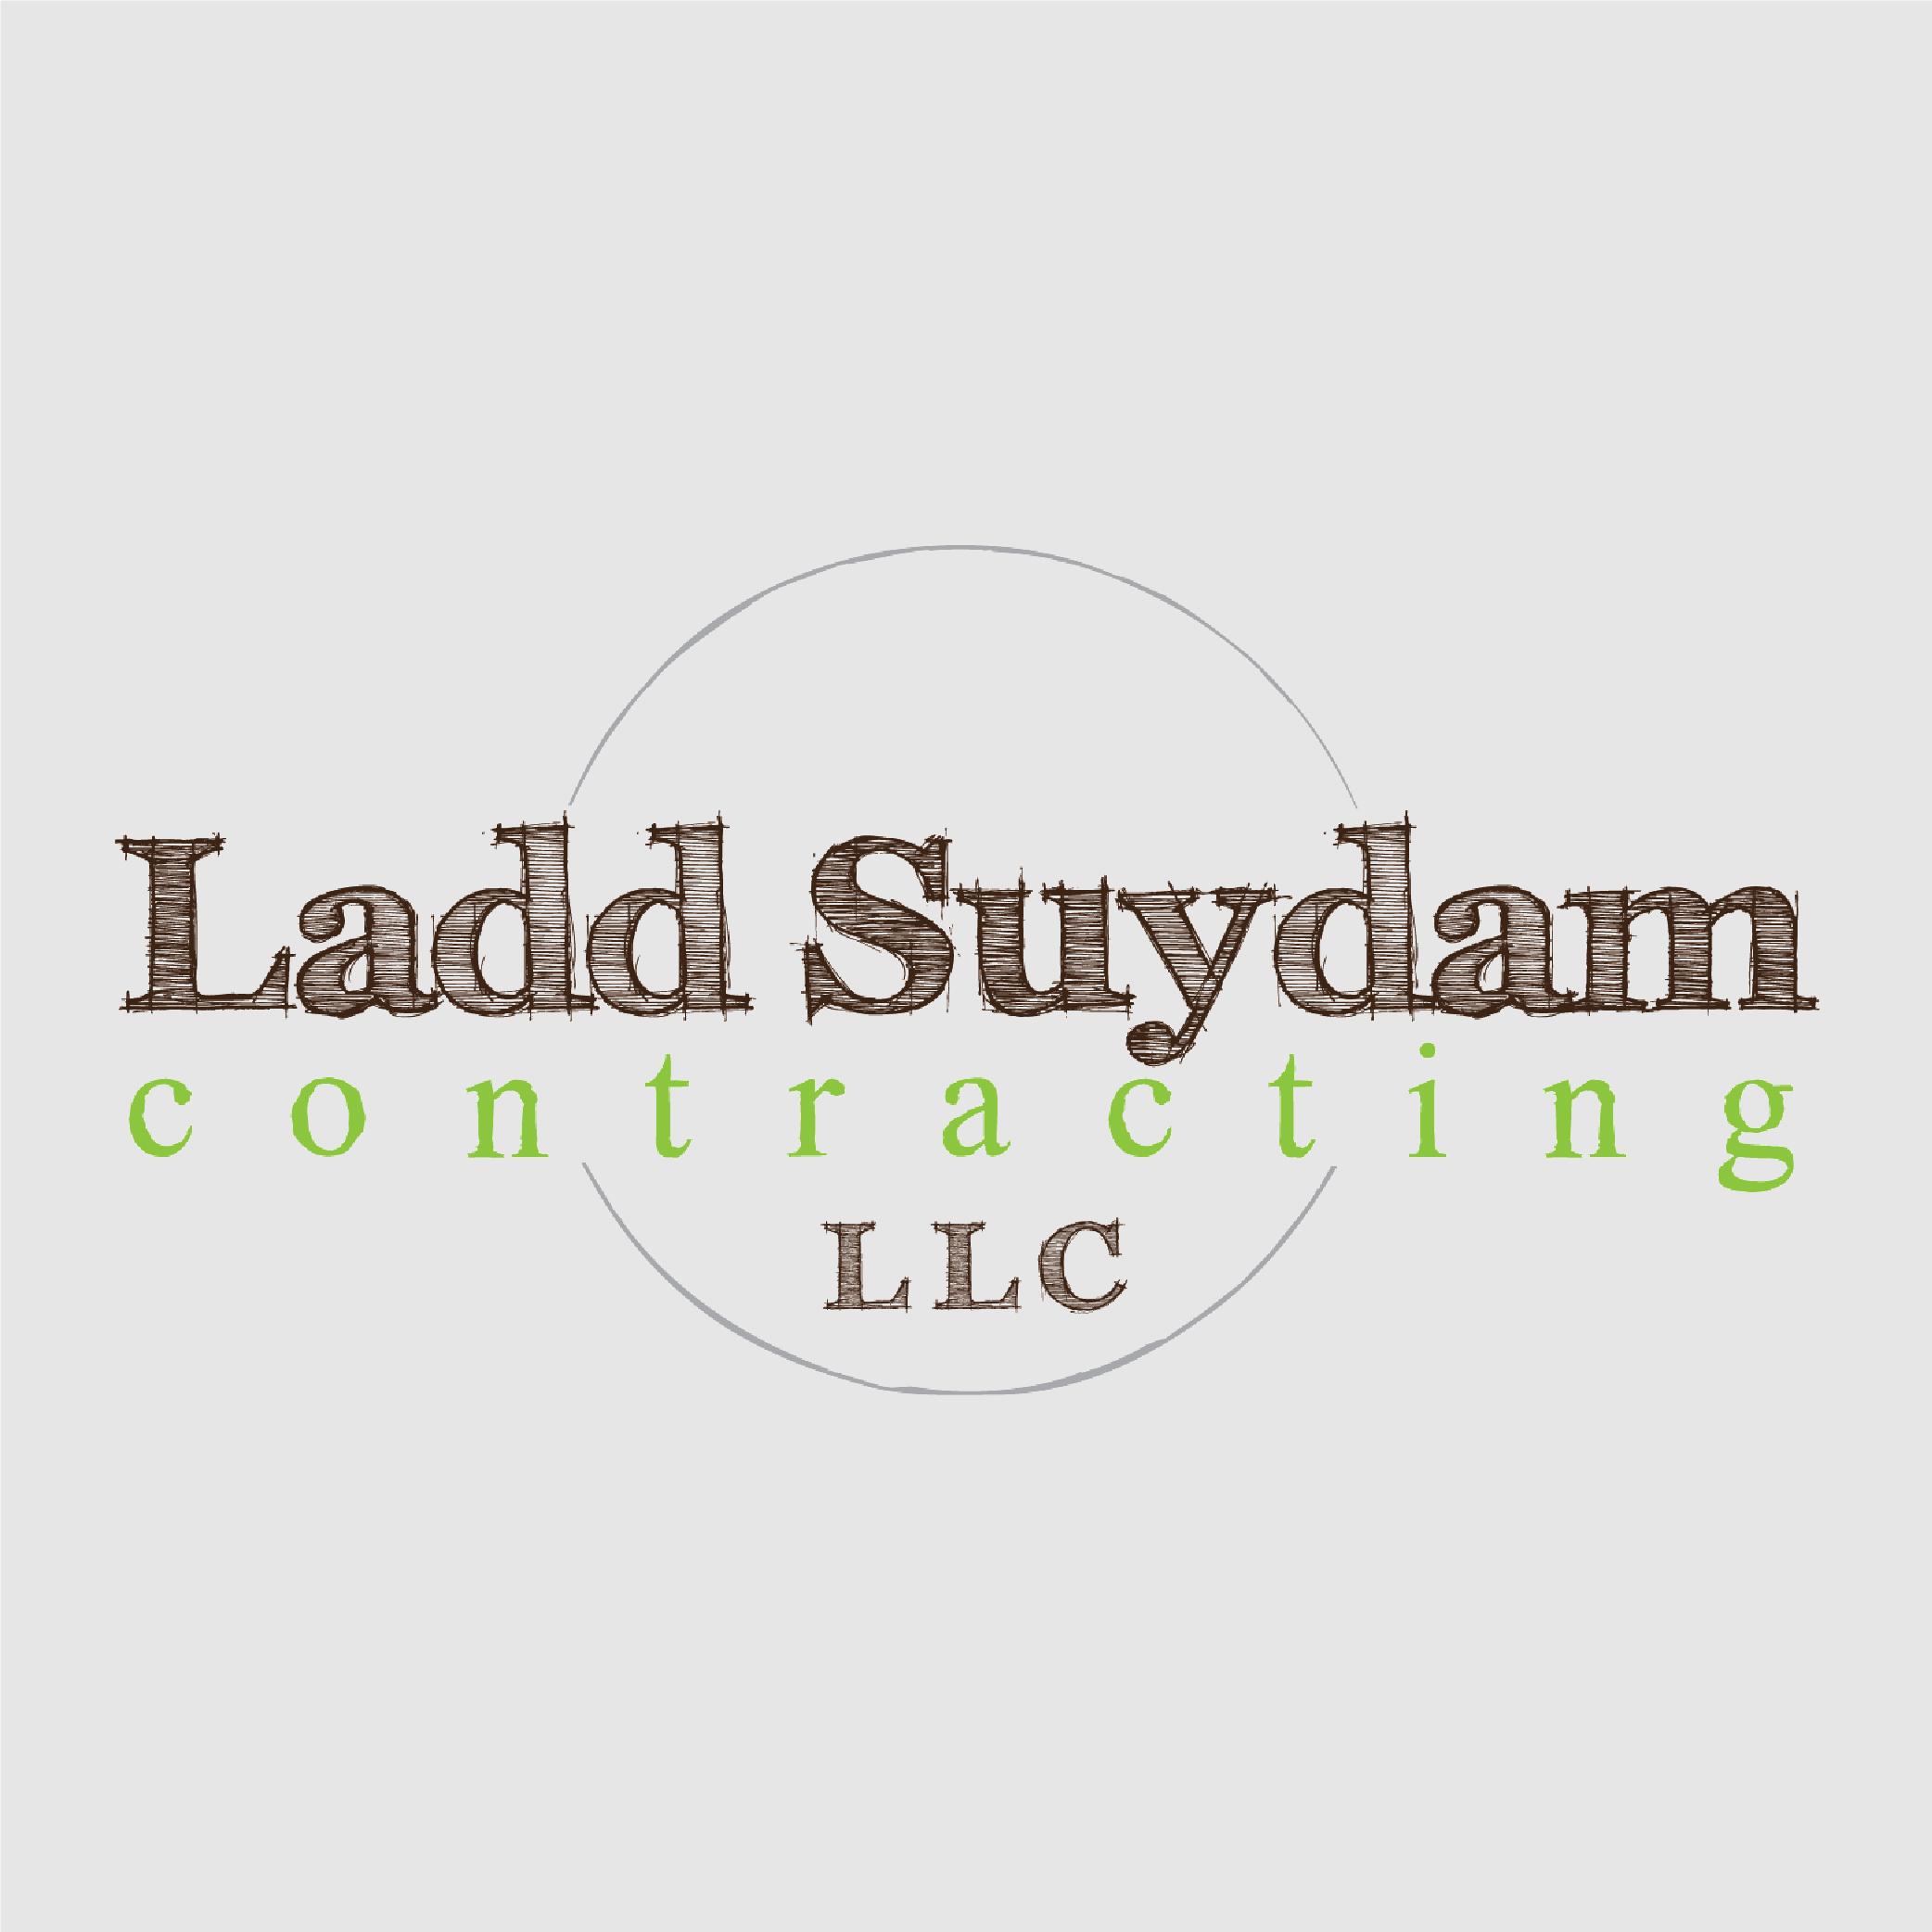 Ladd Suydam Contracting, LLC    2621 Ann Ave    St. Louis, MO 63104 .     314-324-1537    laddsuydam@gmail.com     www.laddsuydam.com      Member Since: 2018